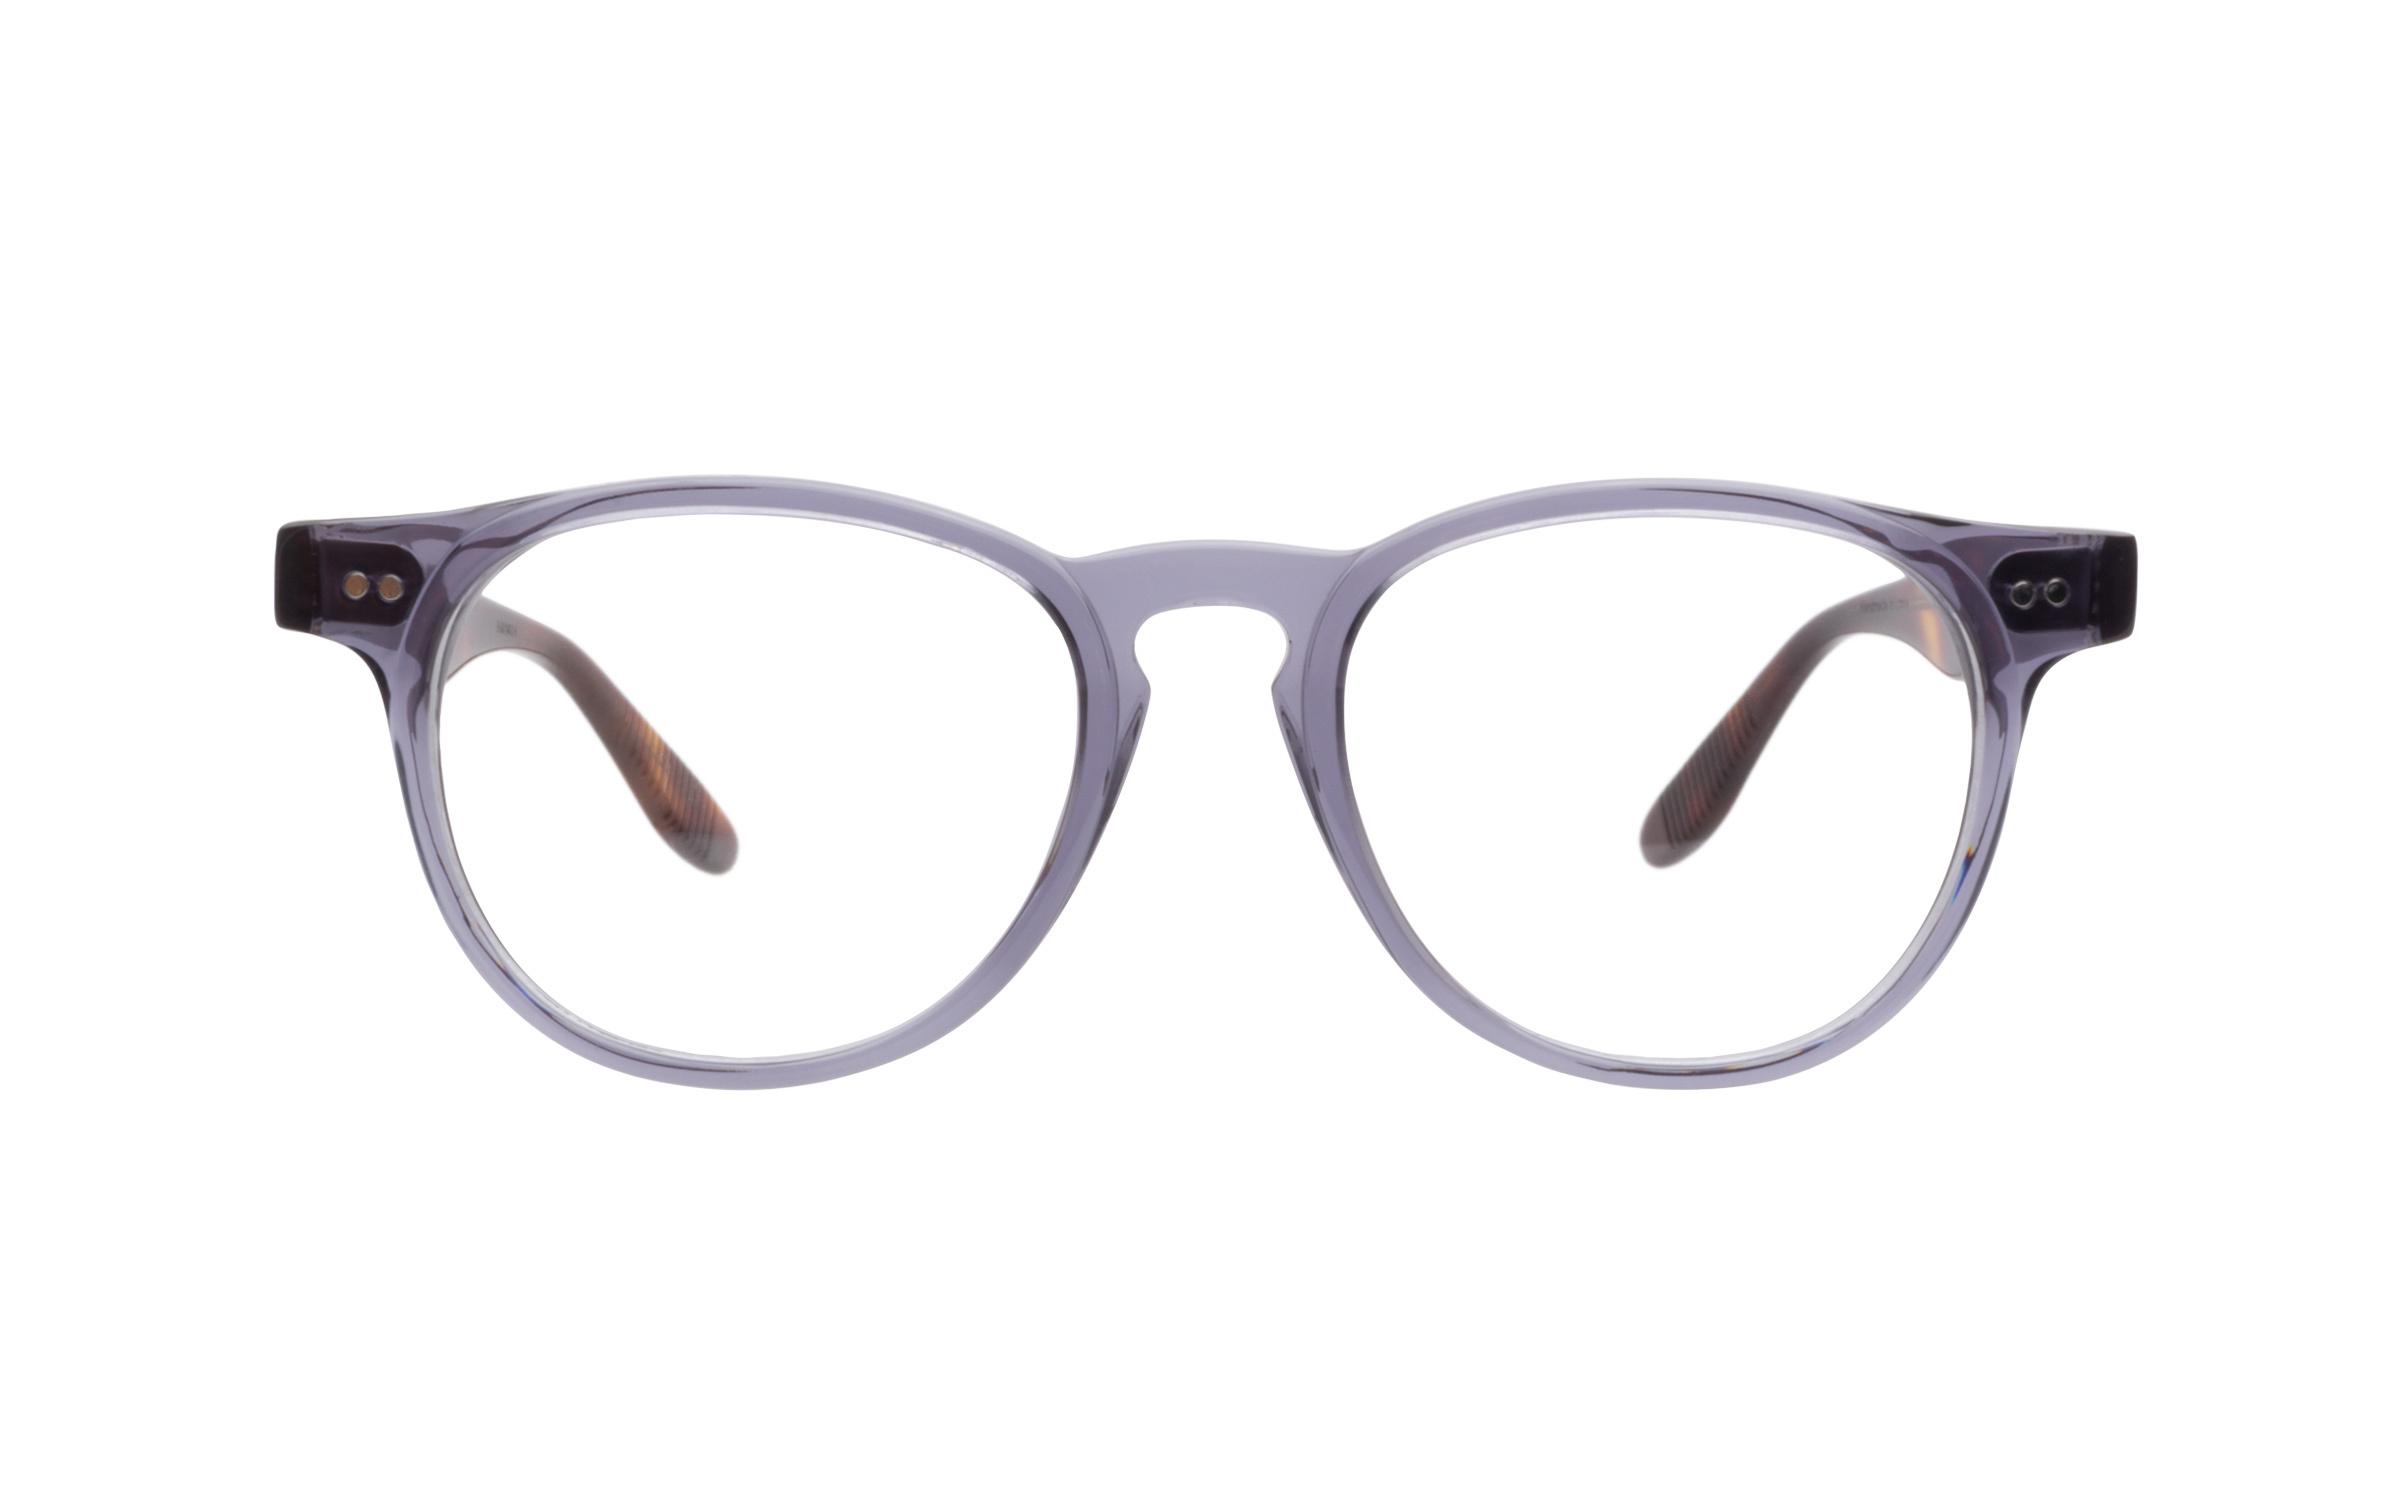 Mens_Vintage_Glasses_Grey_Joseph_Marc_Online_Coastal